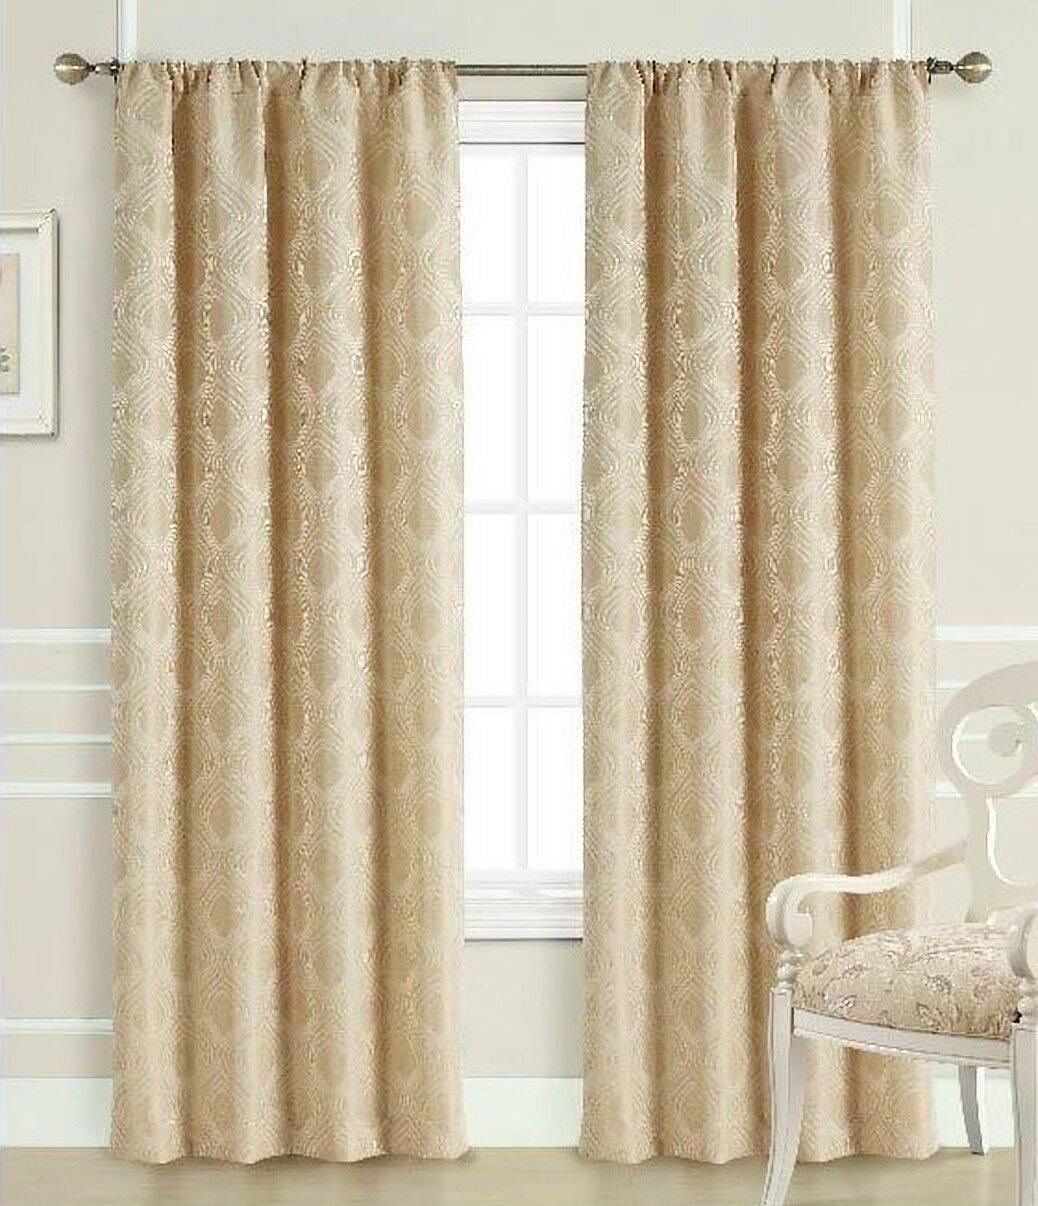 Canora Grey Shurtleff Jacquard Room Darkening Thermal Rod Pocket Single Curtain Panel Wayfair